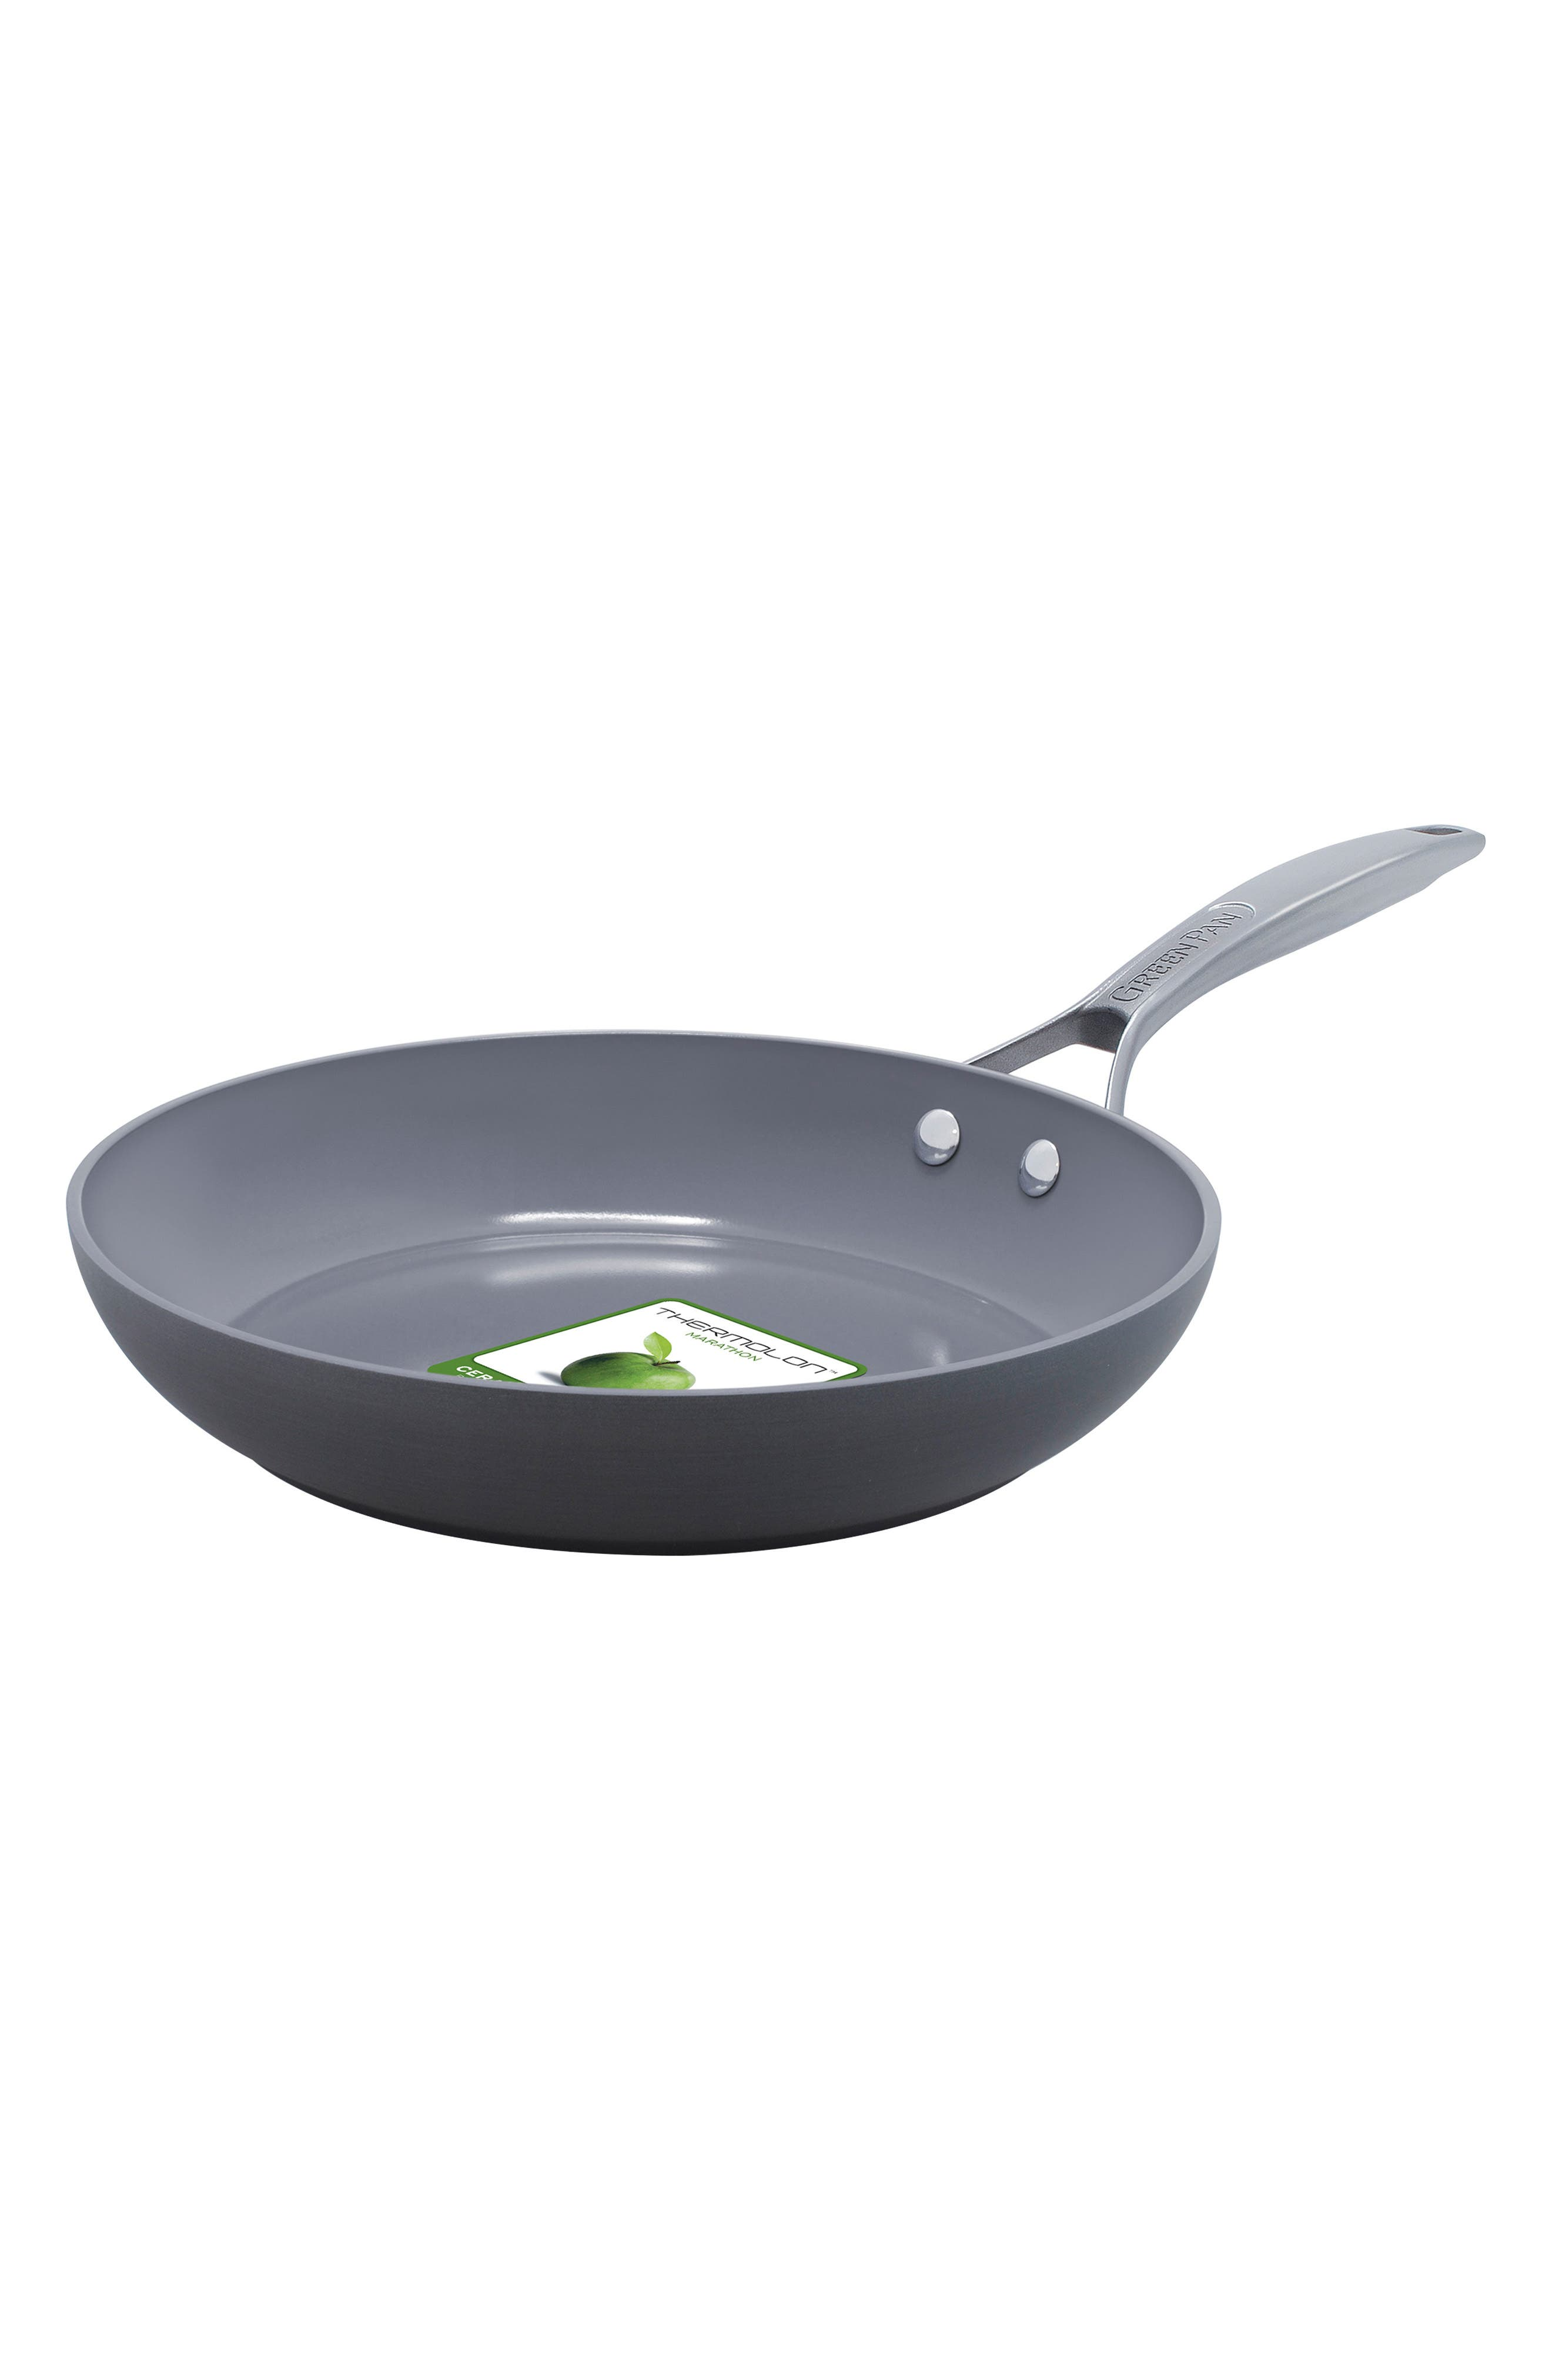 Paris 8-Inch Anodized Aluminum Ceramic Nonstick Frying Pan,                         Main,                         color, Grey